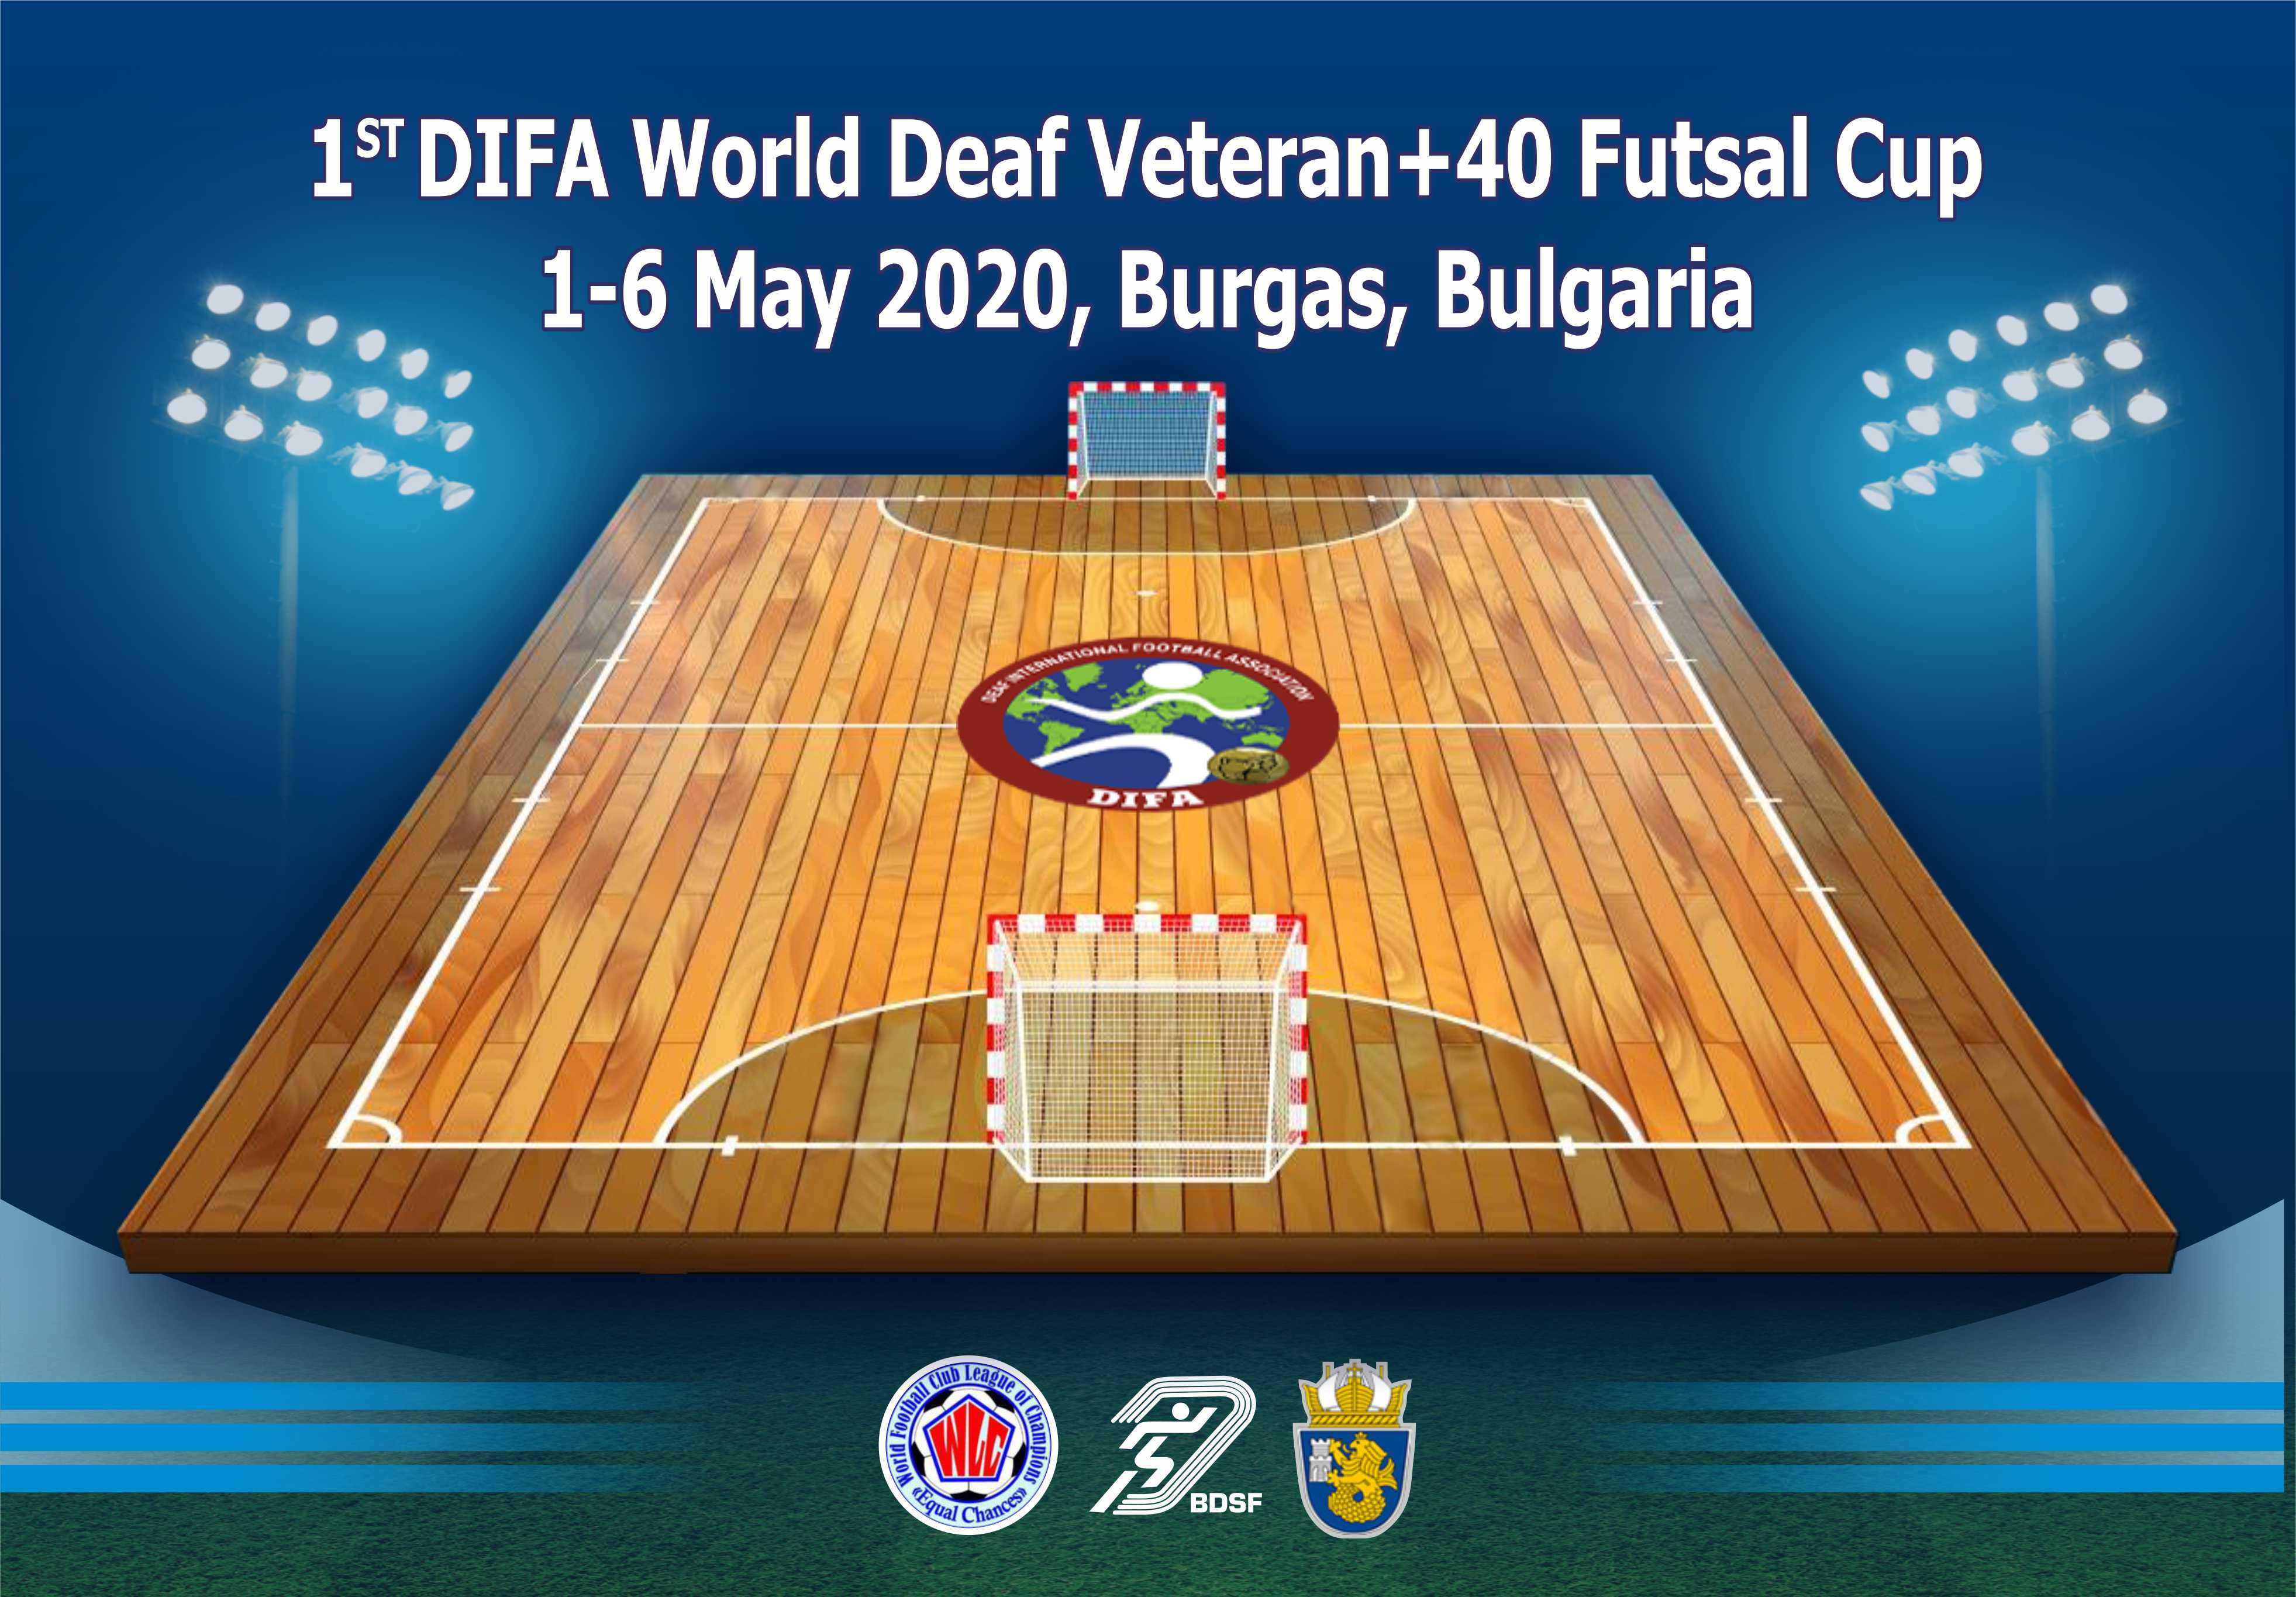 1st Deaf World Futsal Cup Veteran +40 (1-6 May 2020, Bourgas Bulgaria)